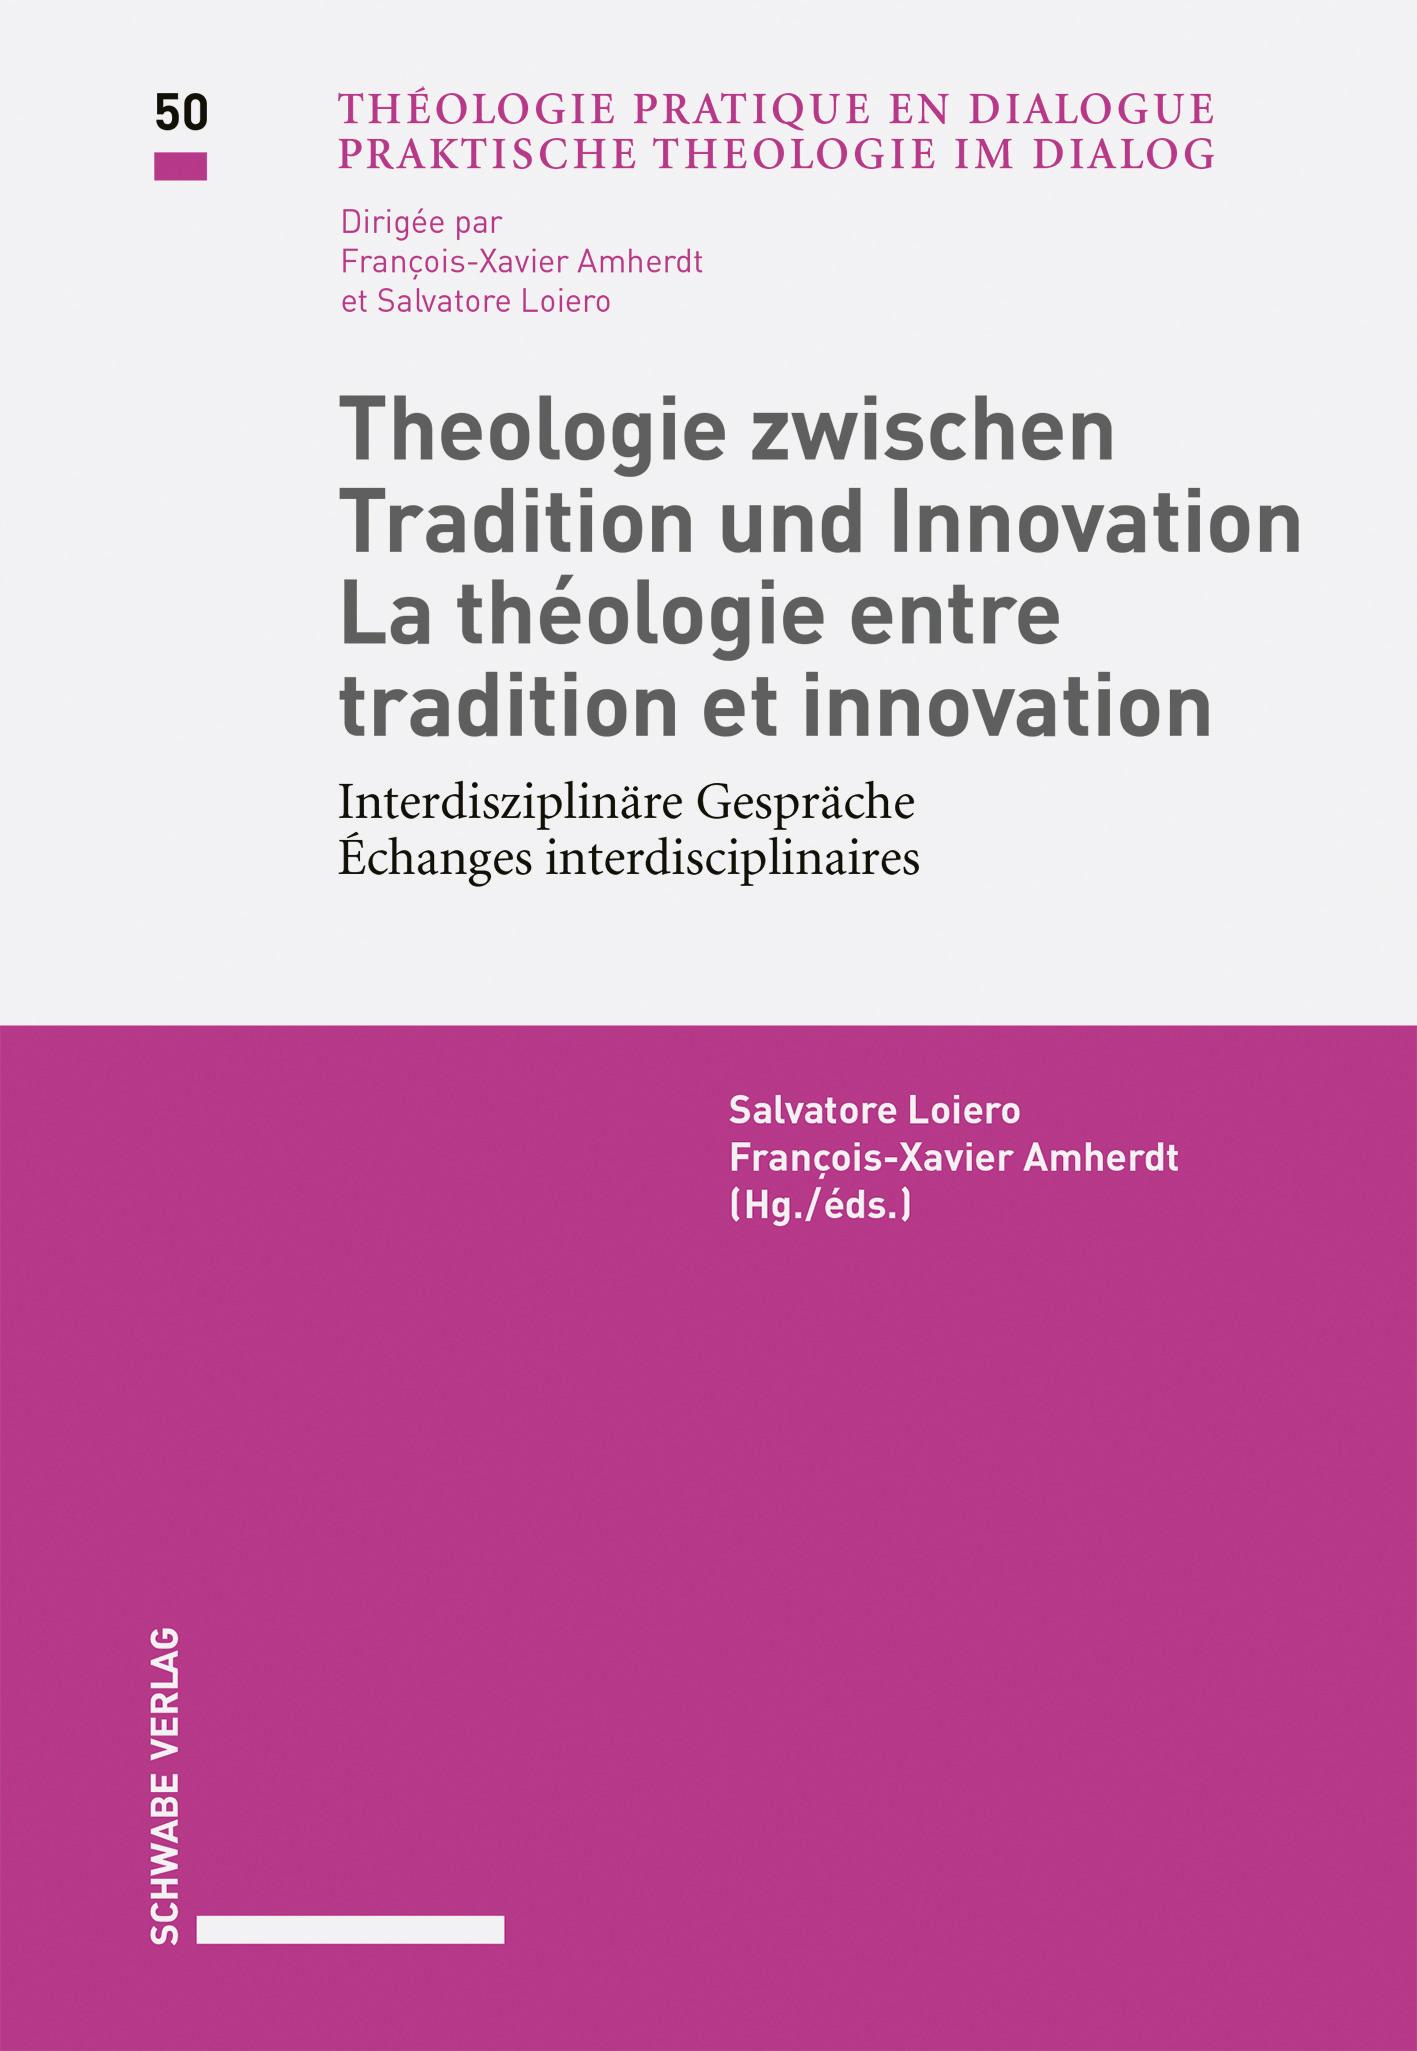 Praktische Theologie im Dialog / Théologie pratique en dialogue